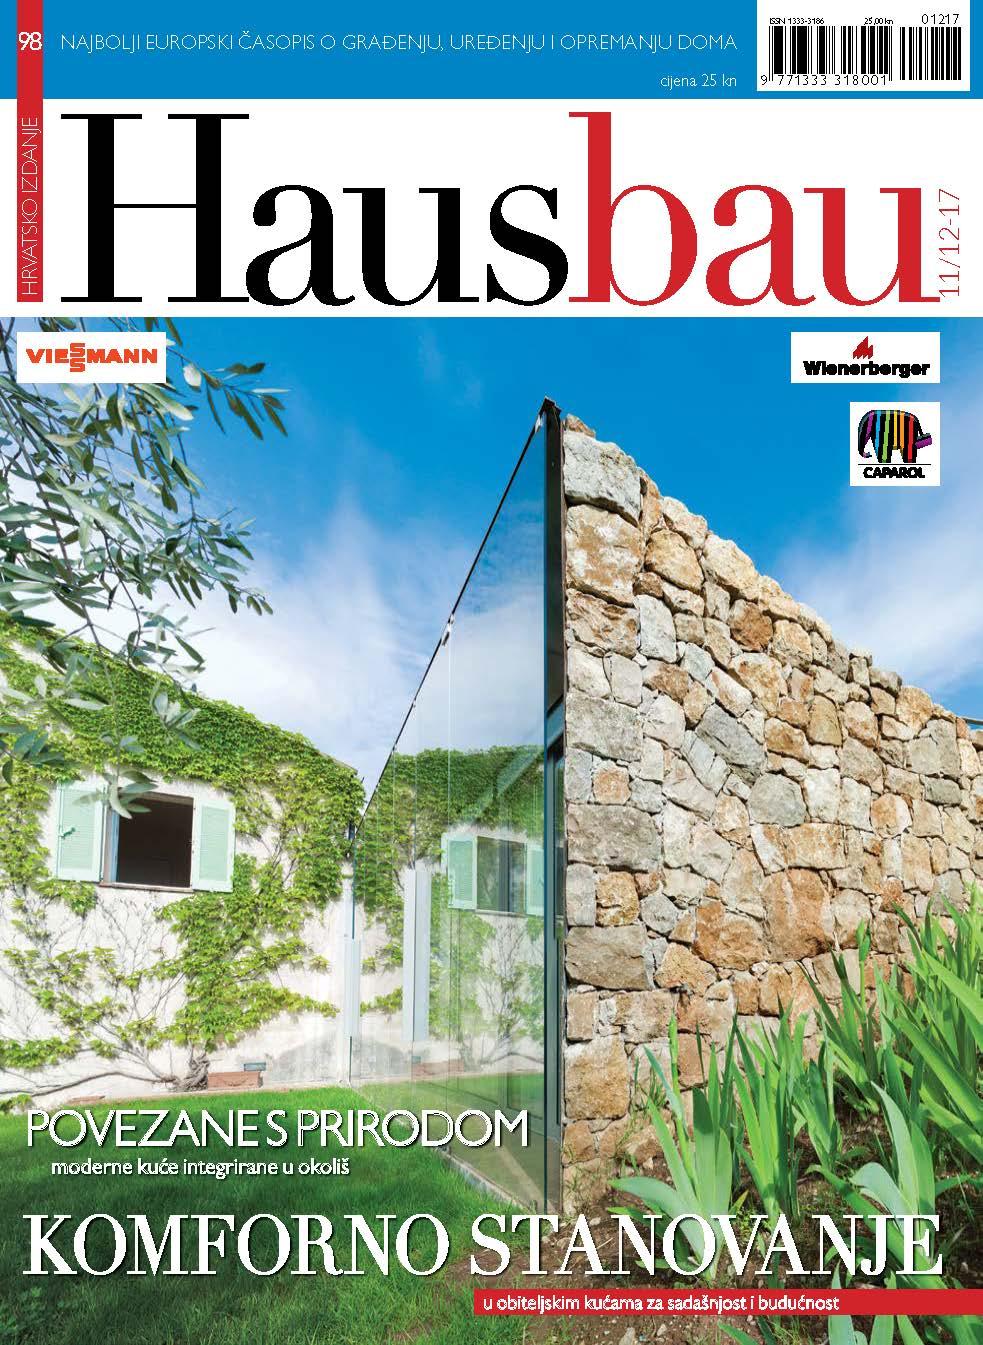 Hausbau br. 98 (11/12 2017)